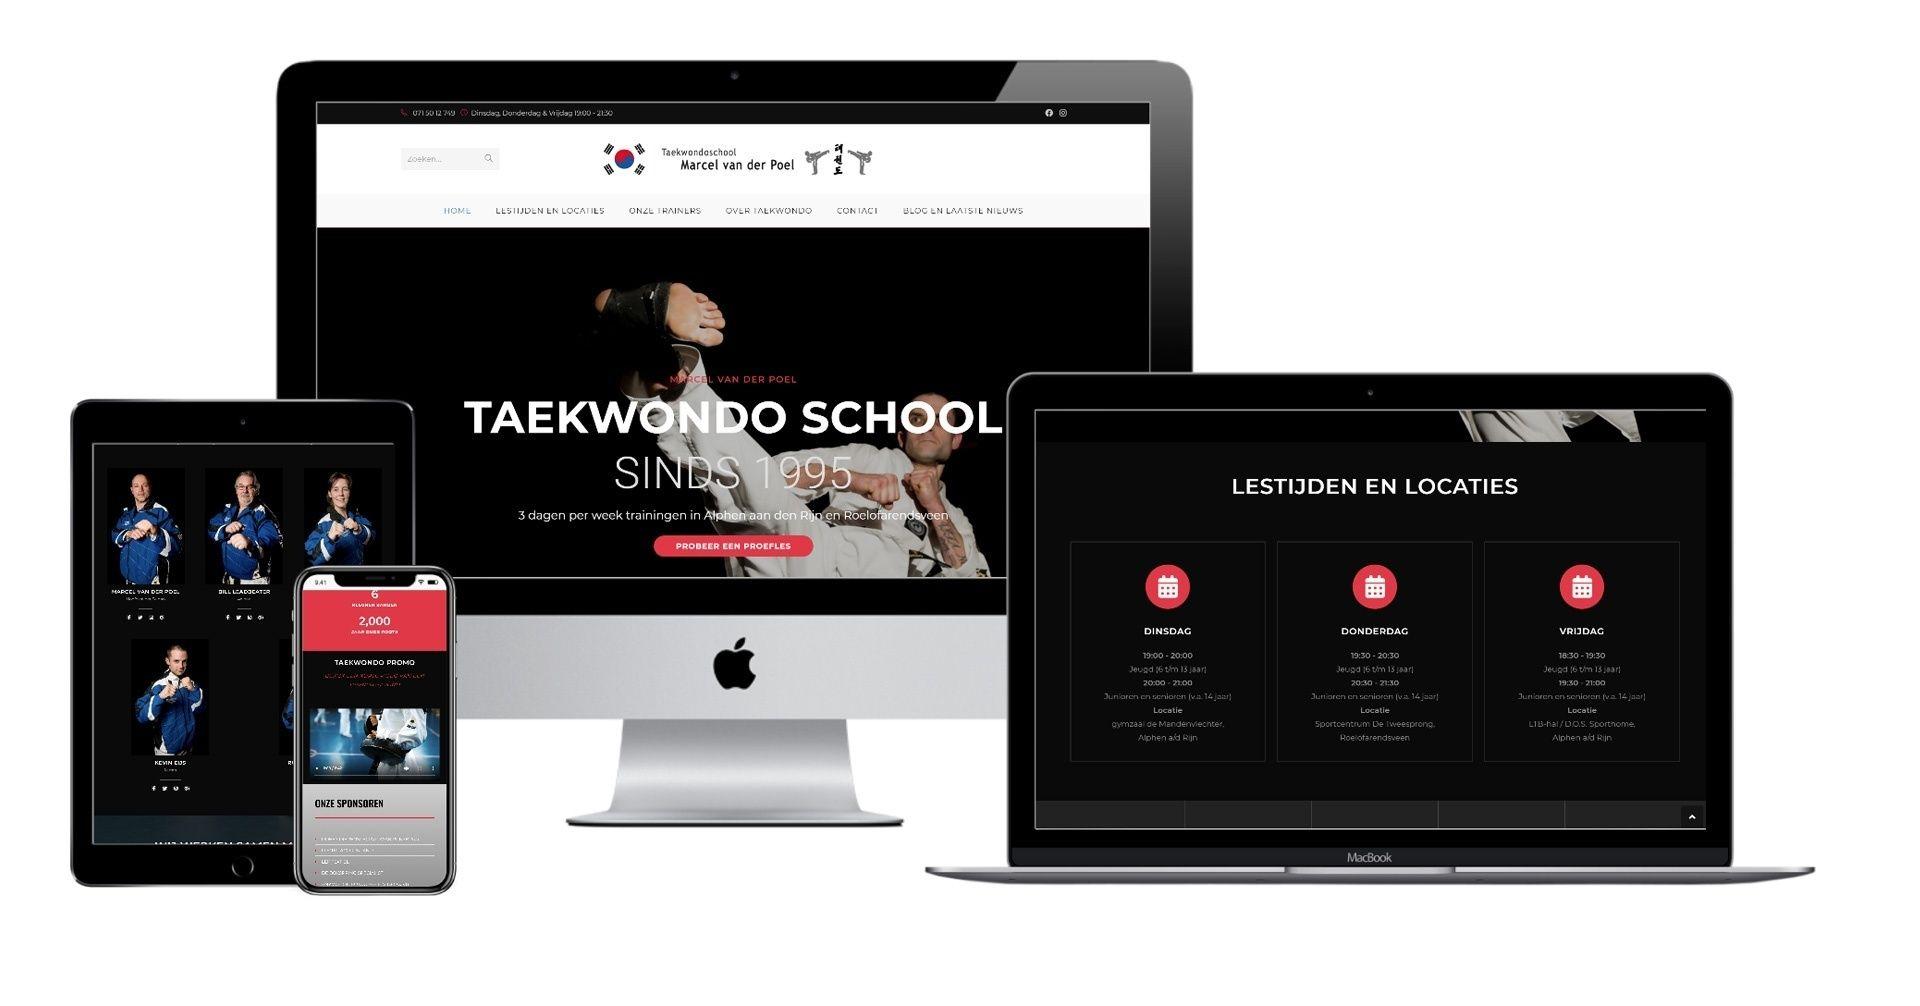 Website Taekwondoschool Marcel van der Poel